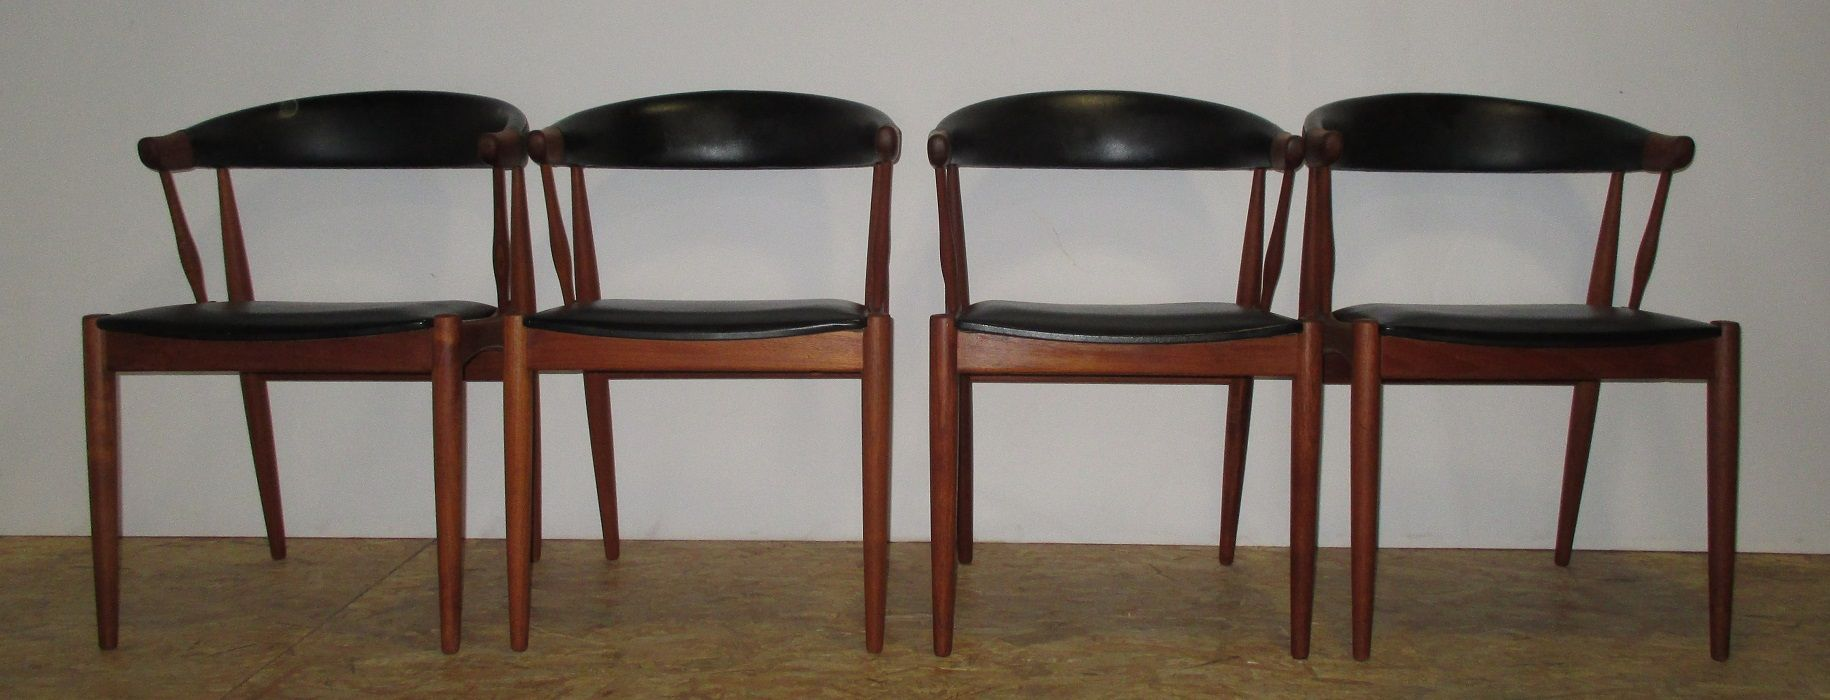 Danish Dining Chair danish dining chairsjohannes andersen for brdr, 1964, set of 4